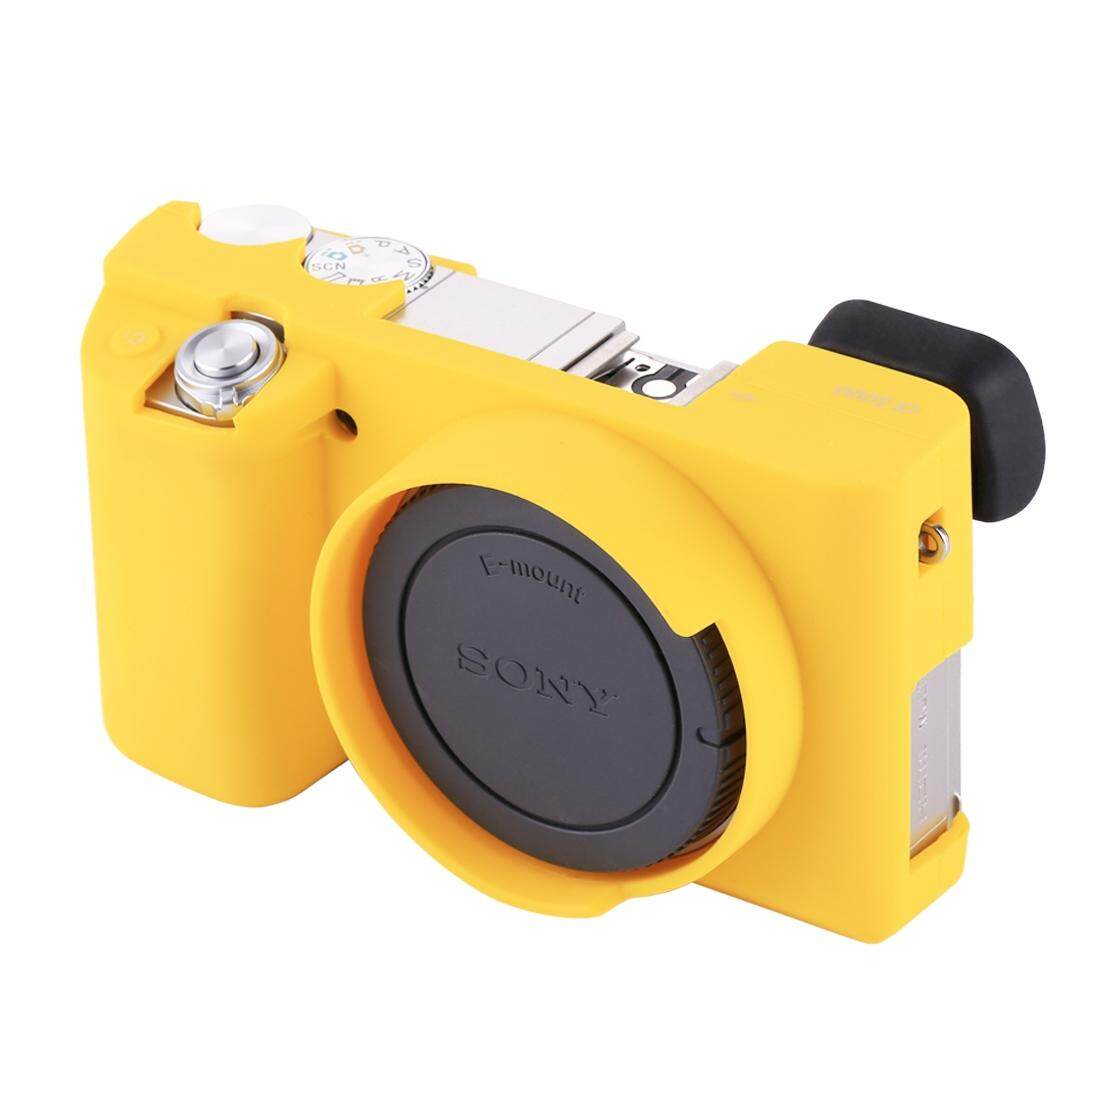 Puluz Casing Silikon Lembut Case untuk Sony ILCE-6000 (Kuning)-Intl